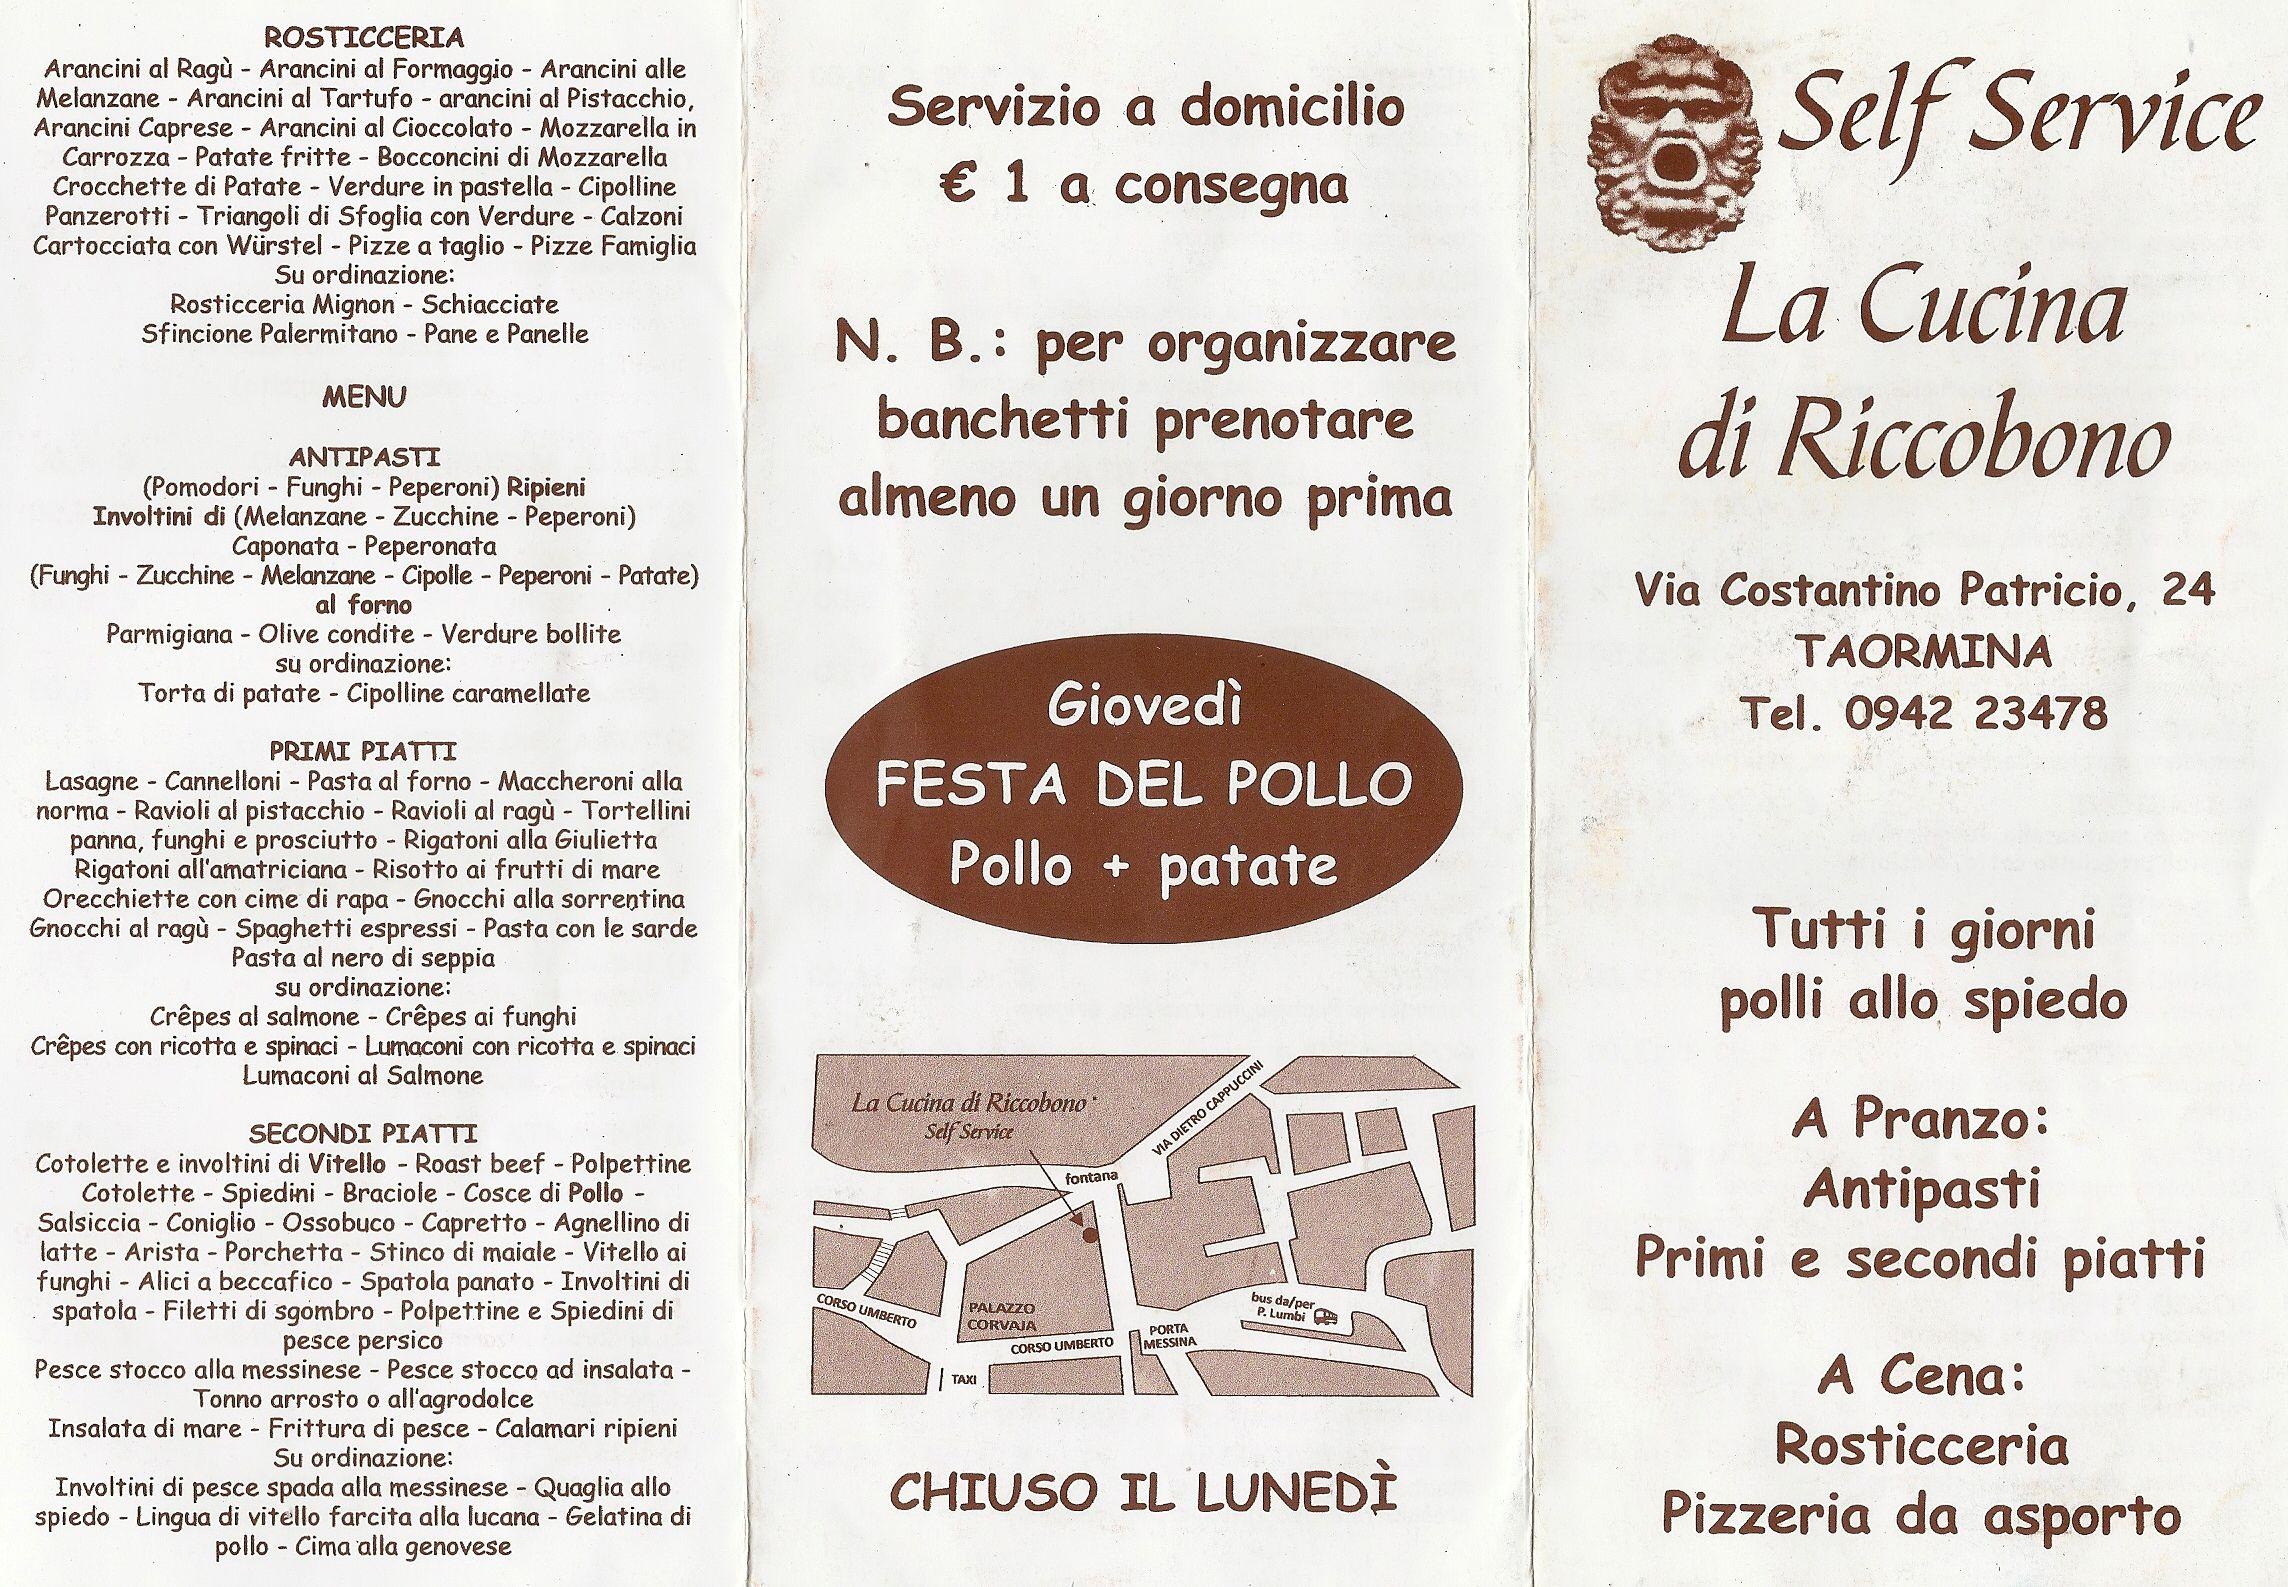 ulotka-la-cuccina-di-riccobono-z-roku-2012-str-1